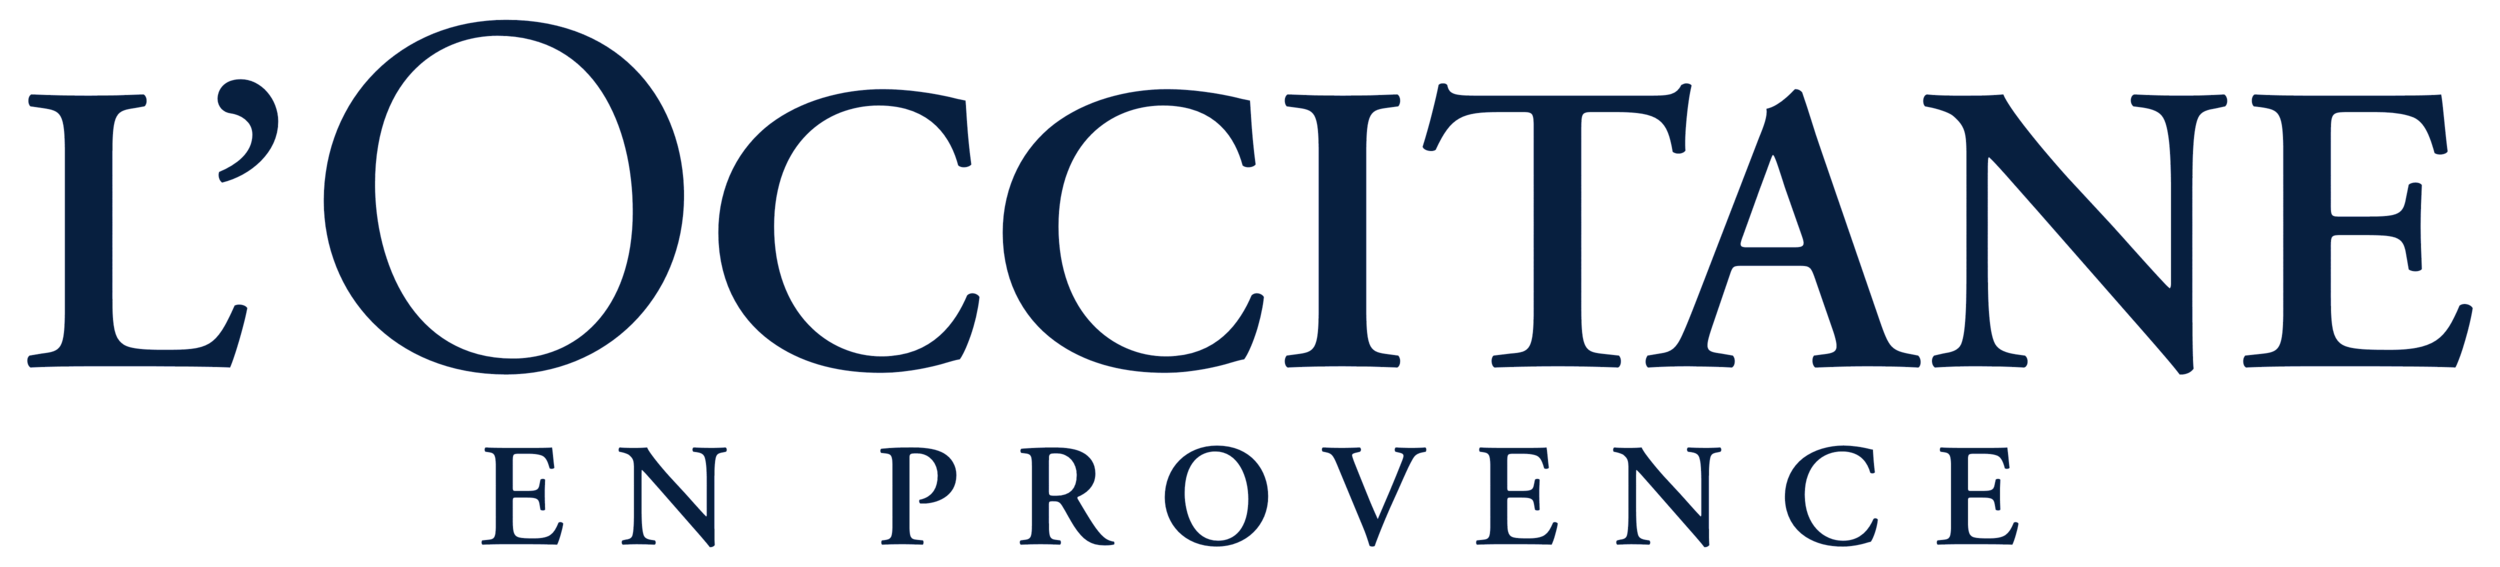 LOccitane_en_Provence_logo_logotype.png